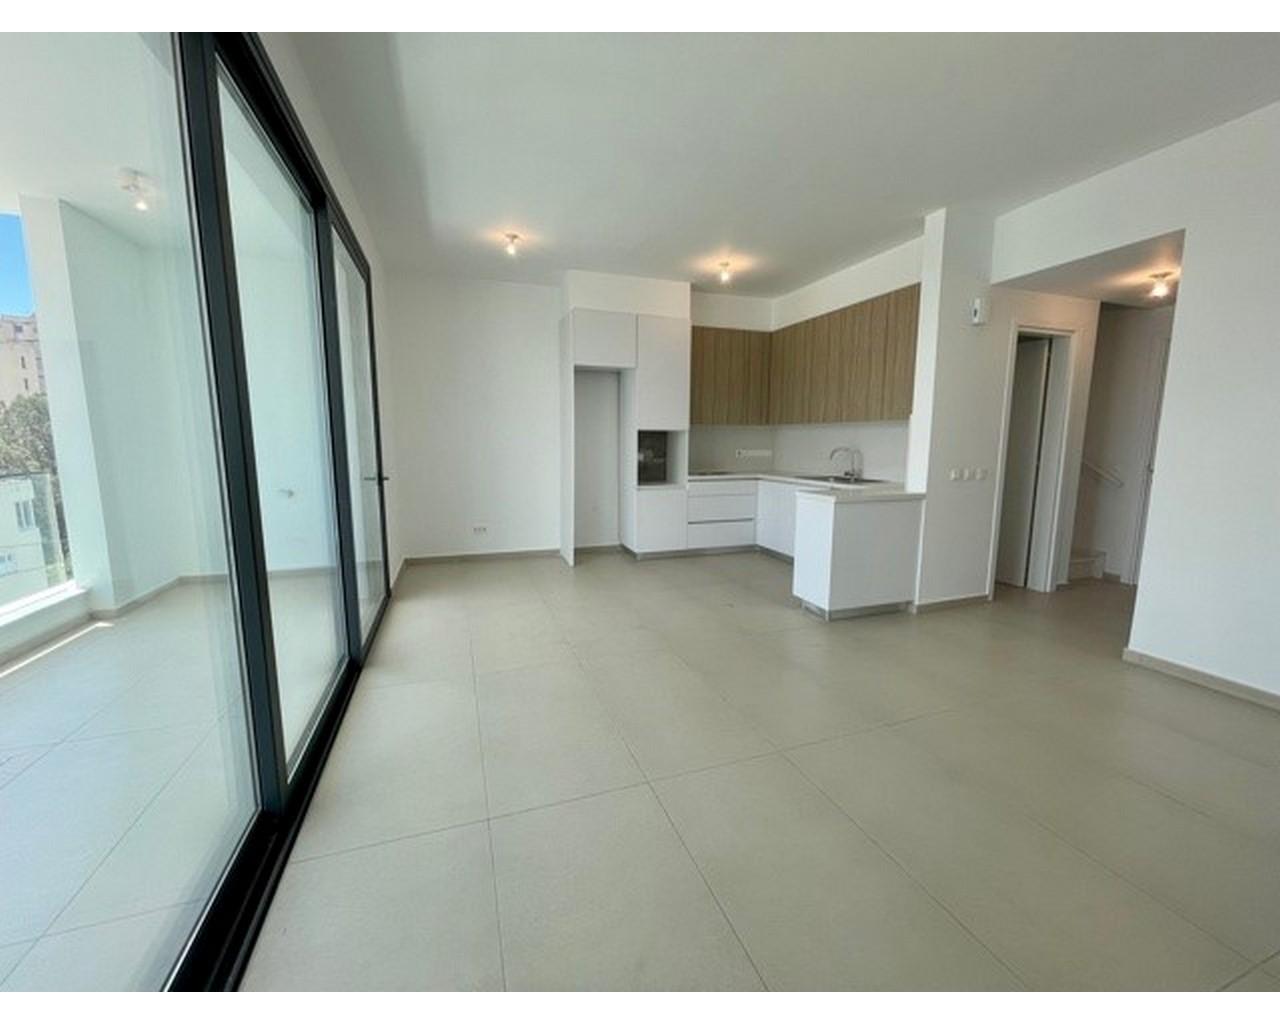 Apartment Nicosia(Strovolos)  2 Bedrooms 2 Bathrooms 91 SqMt.....